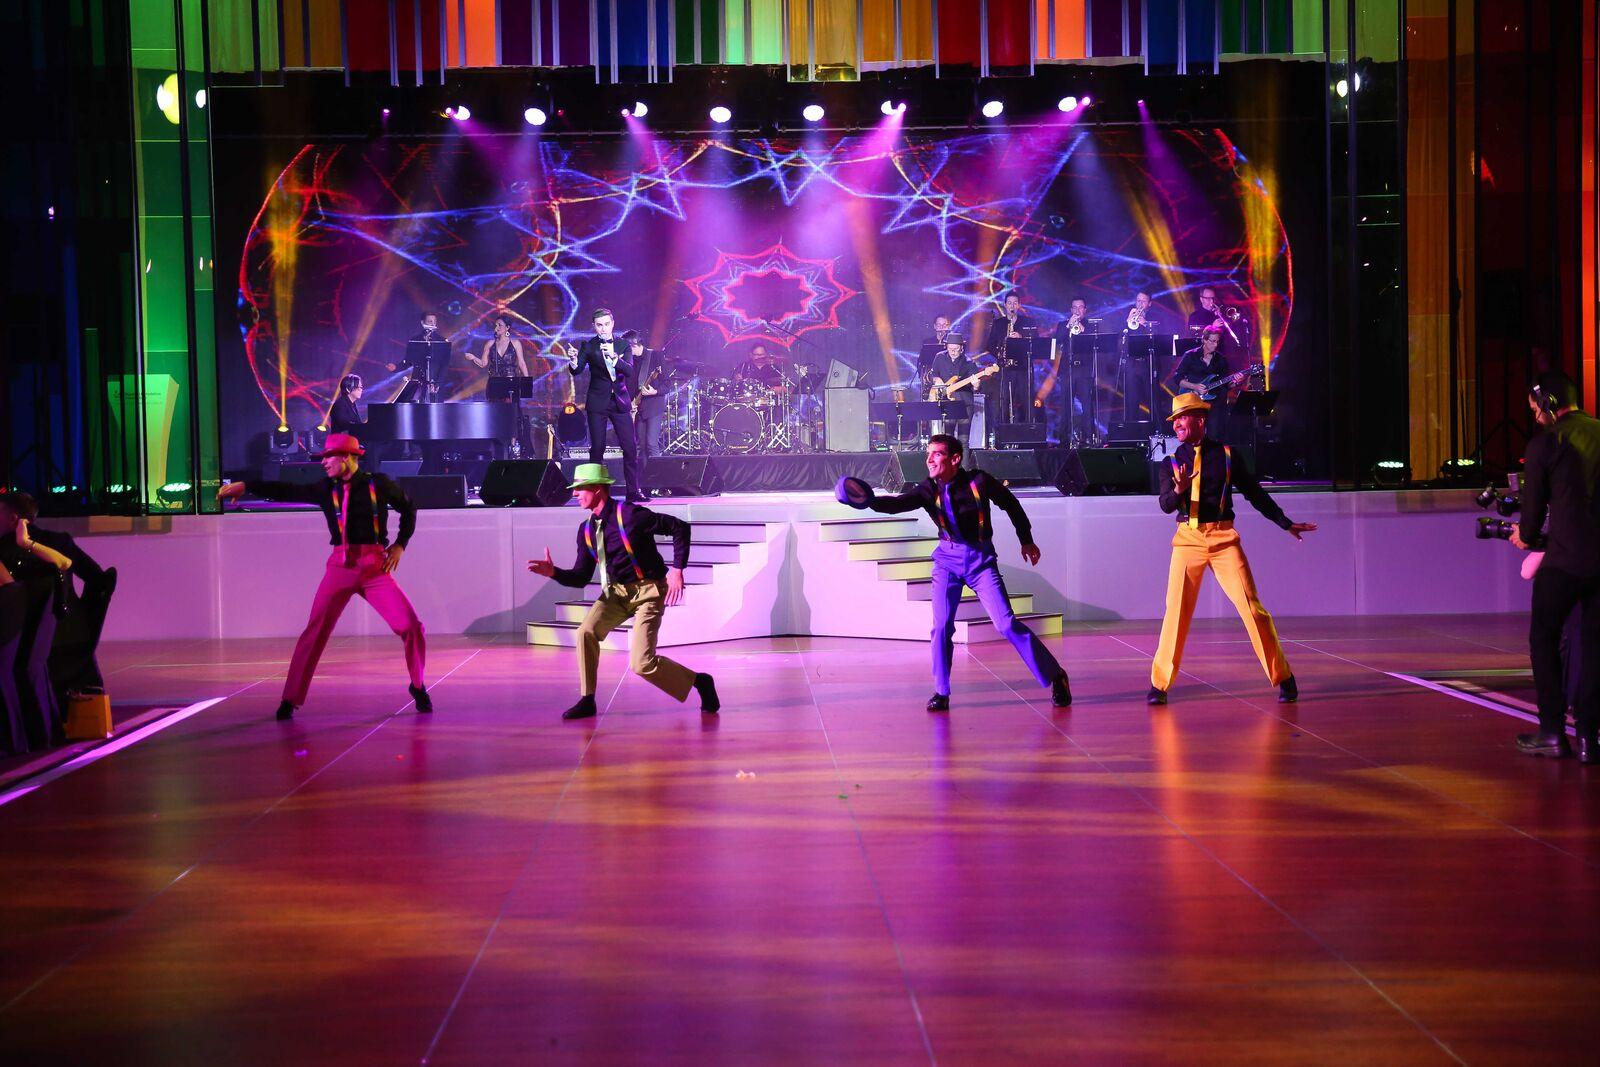 starry-starry-night-2016-dancers-2.jpg